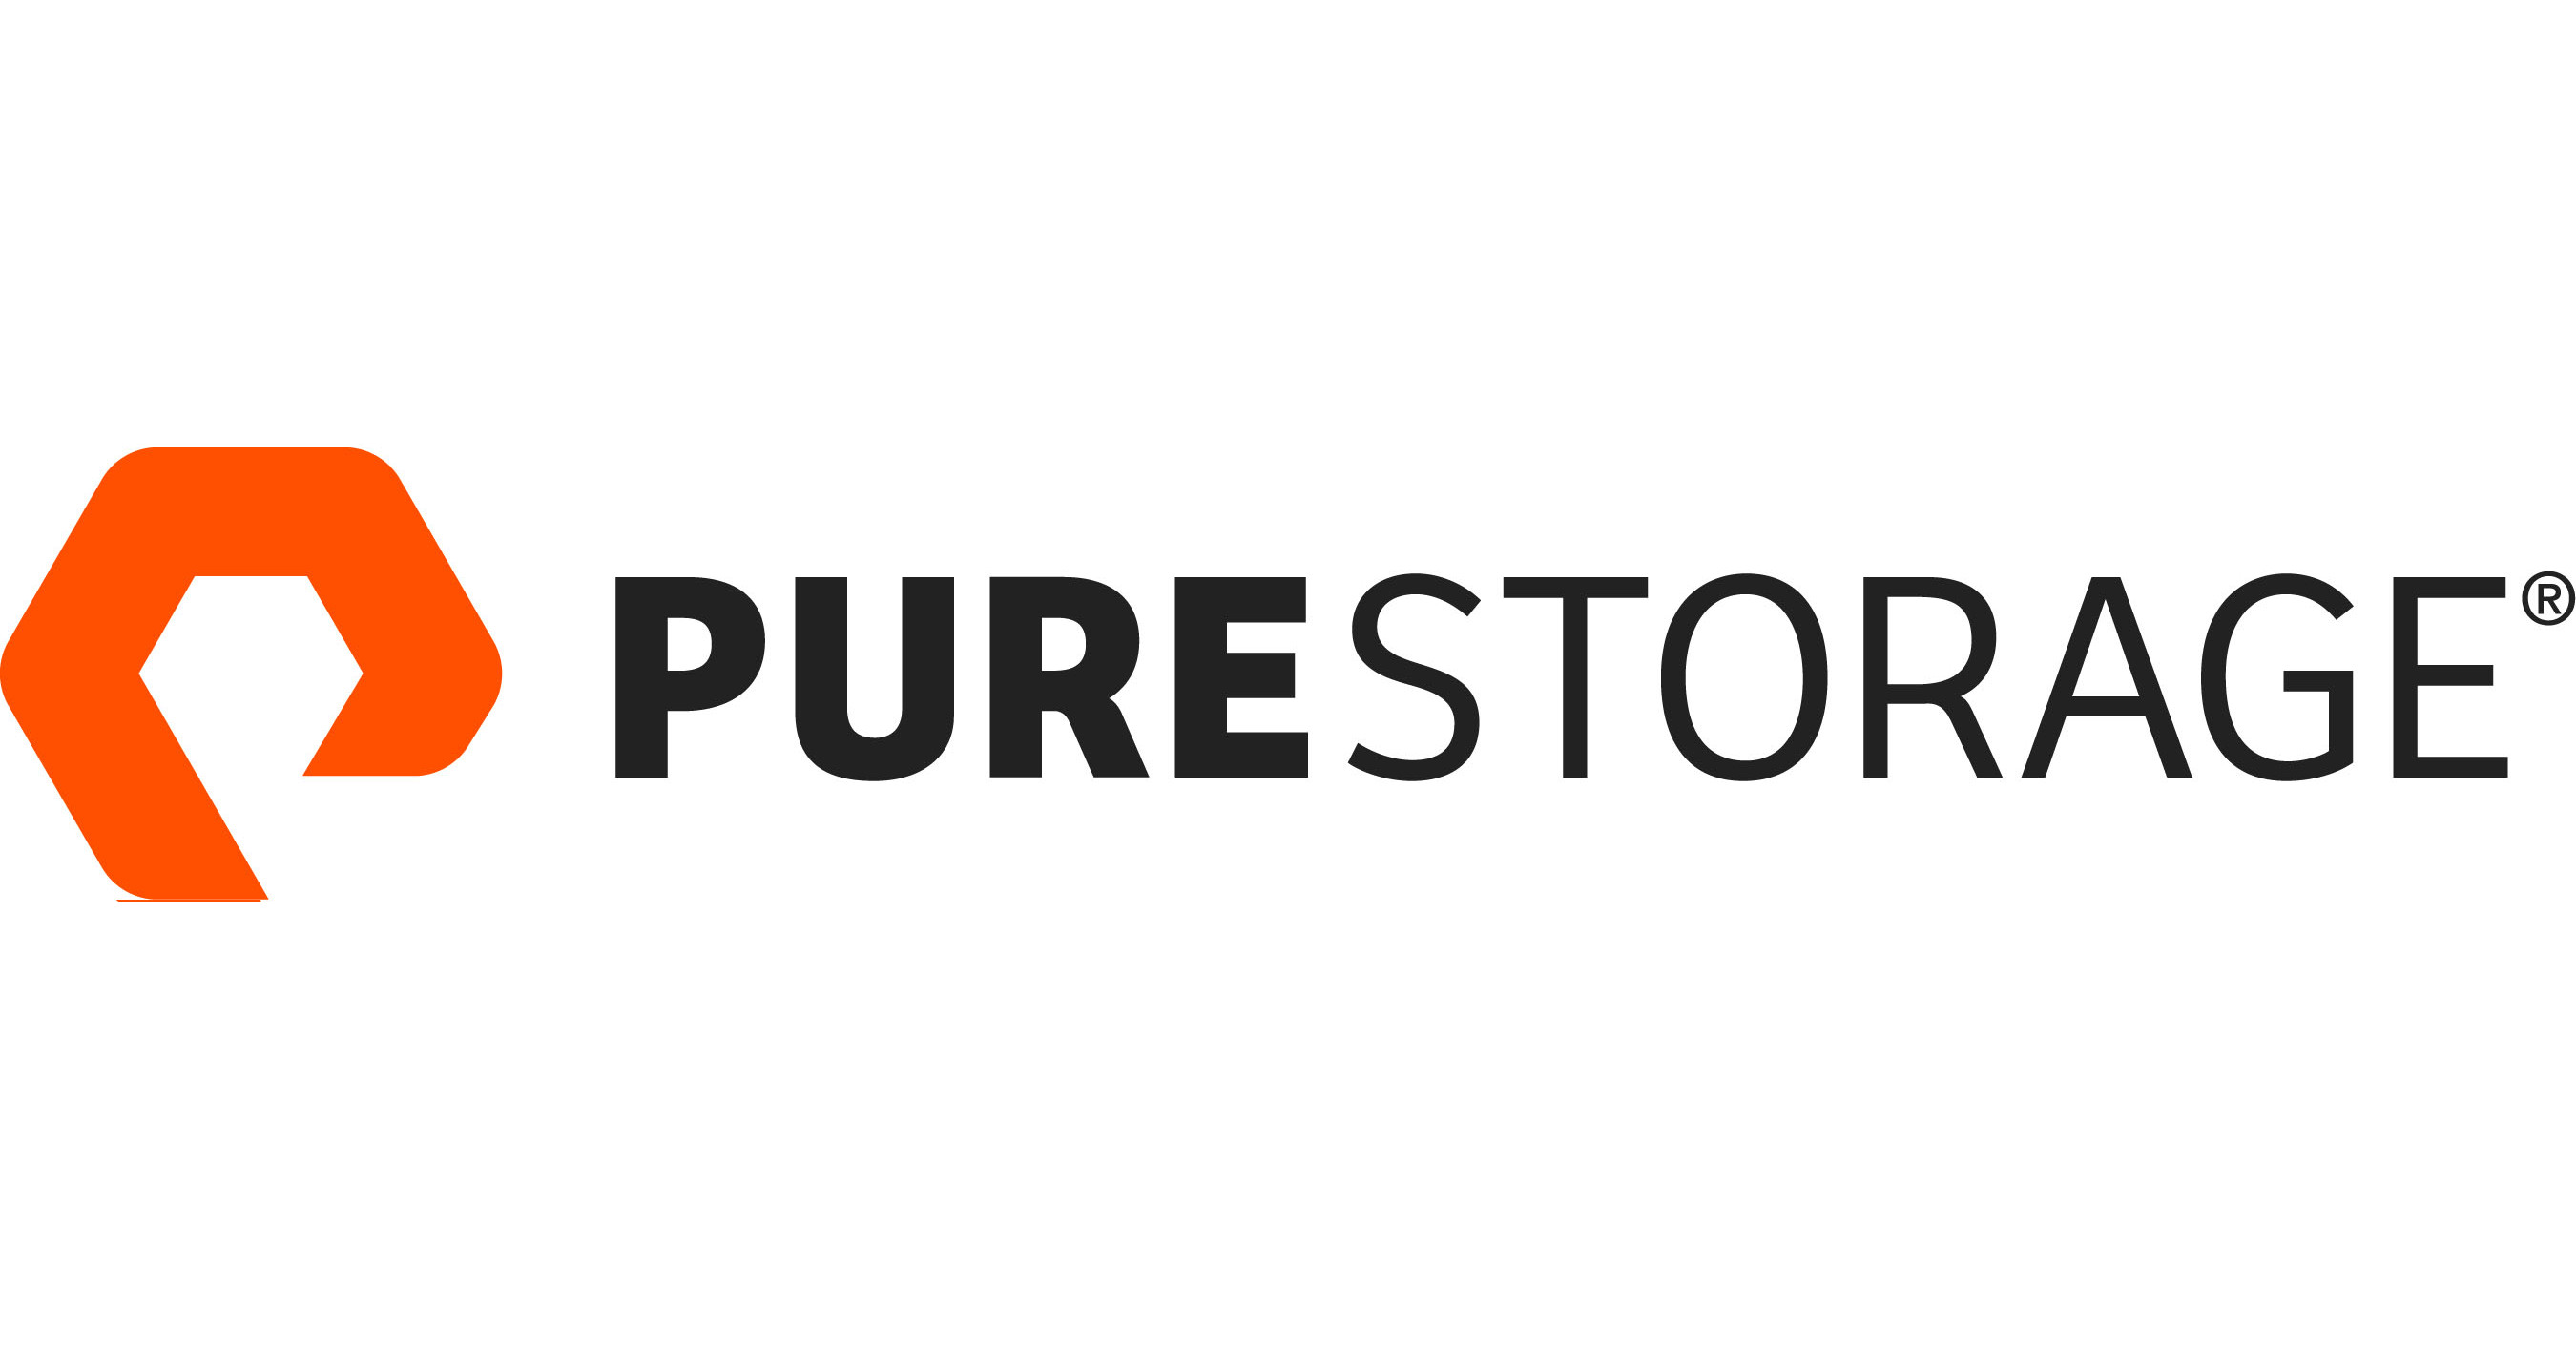 Pure Storage Announces Record Fourth Quarter and Fiscal